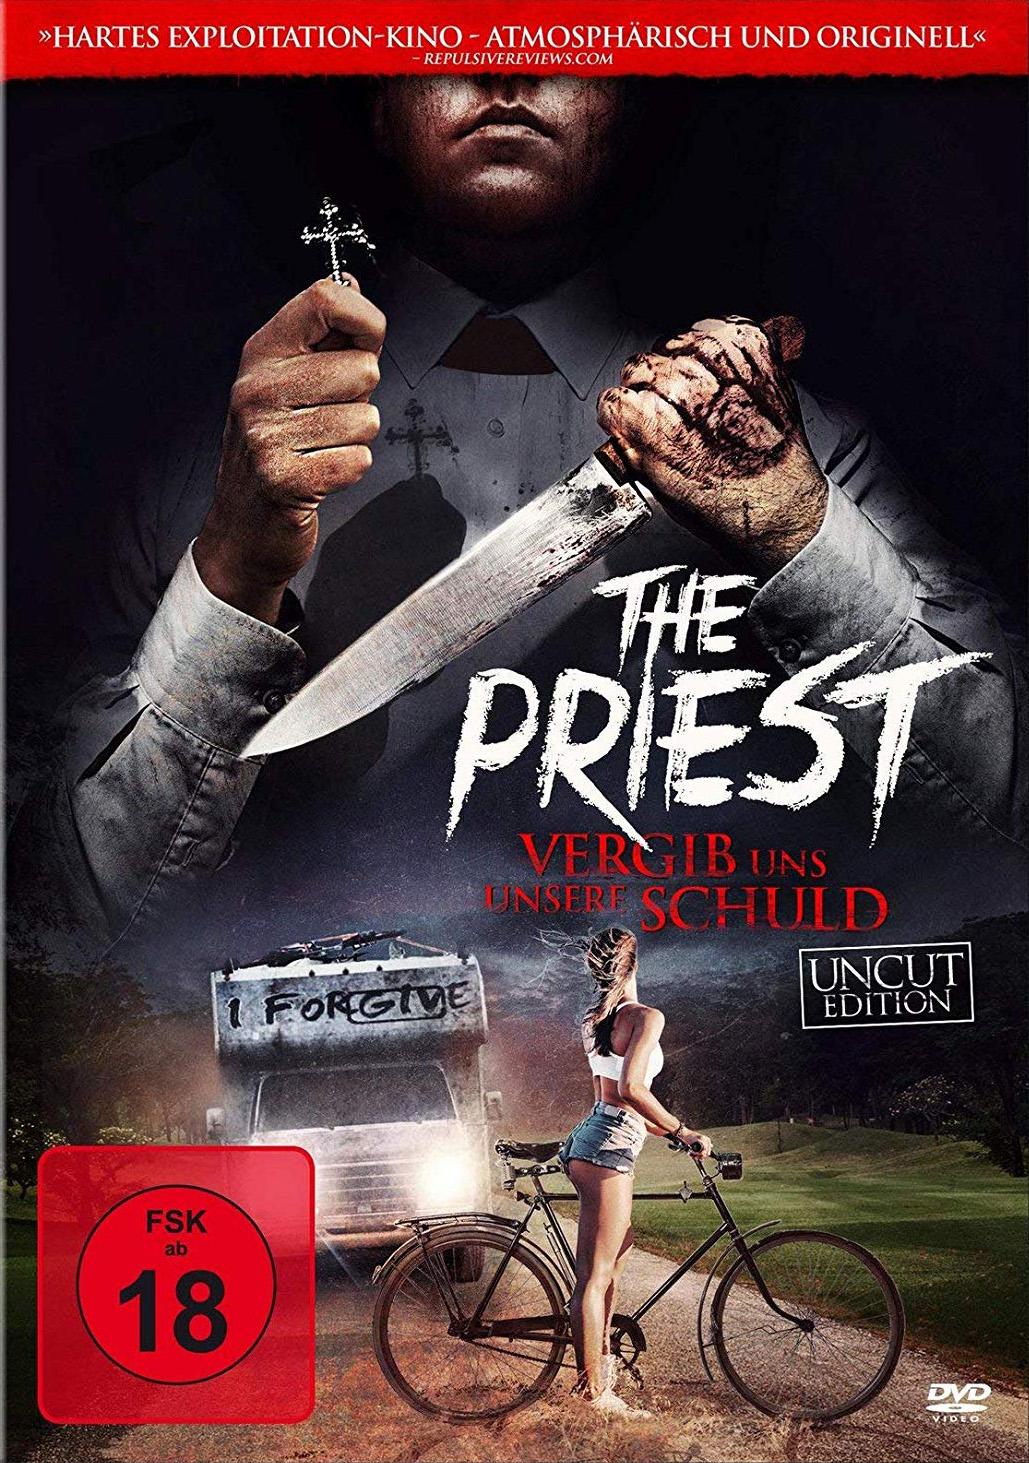 The Priest - Vergib Uns Unsere Schuld